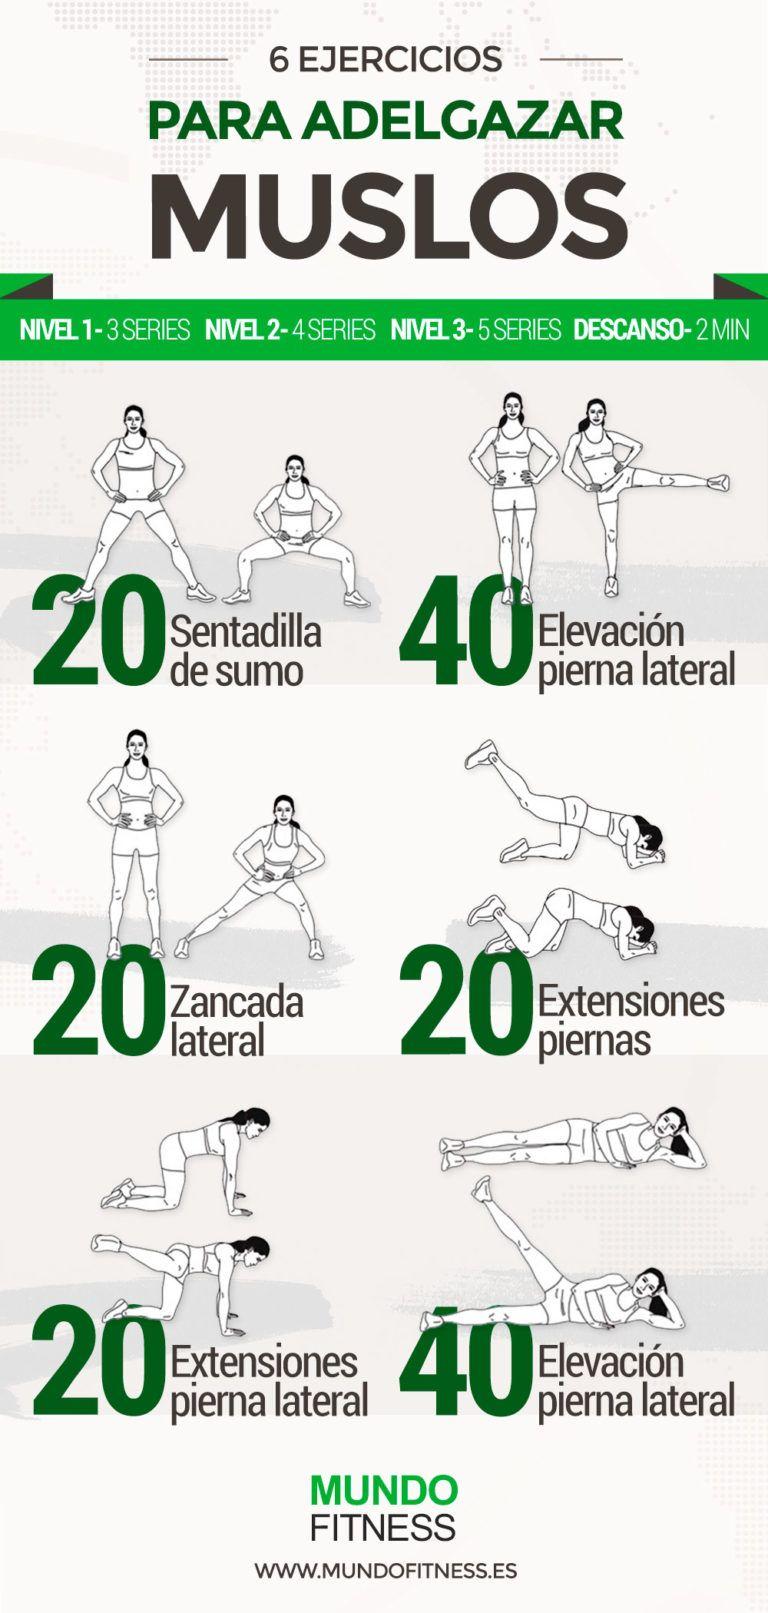 ejercicios para adelgazar en casa piernas